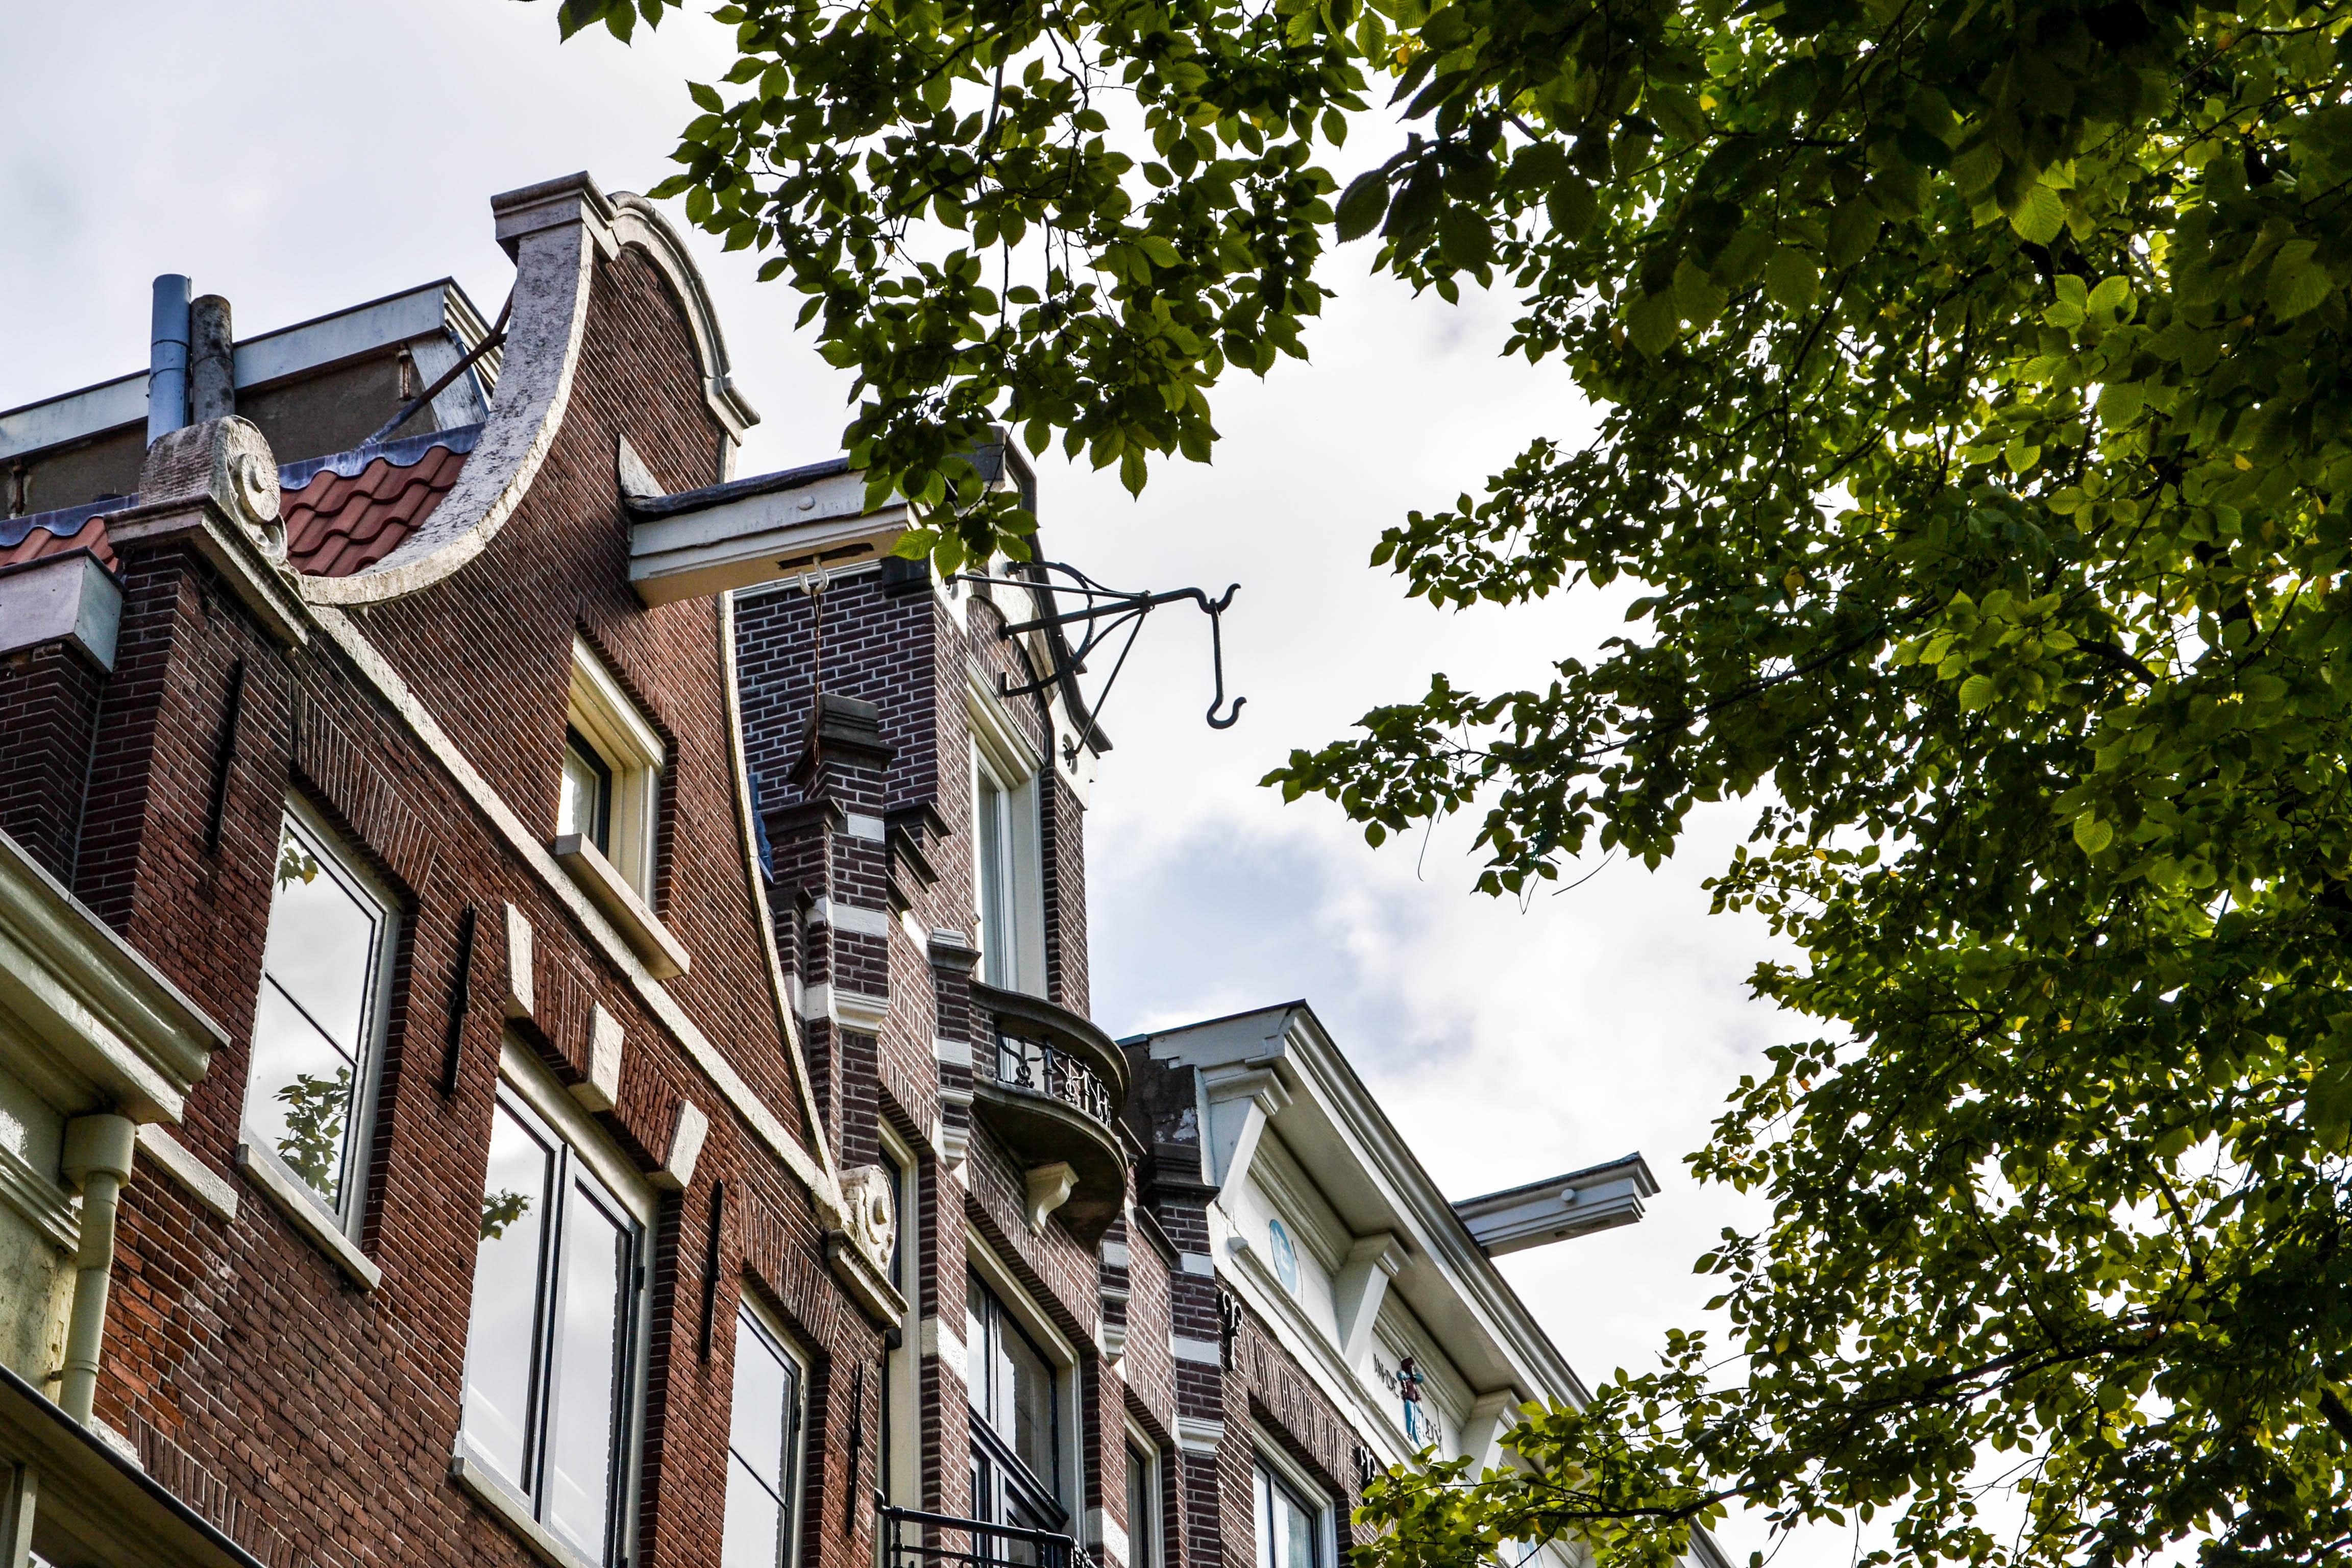 Amsterdam Anne Frank